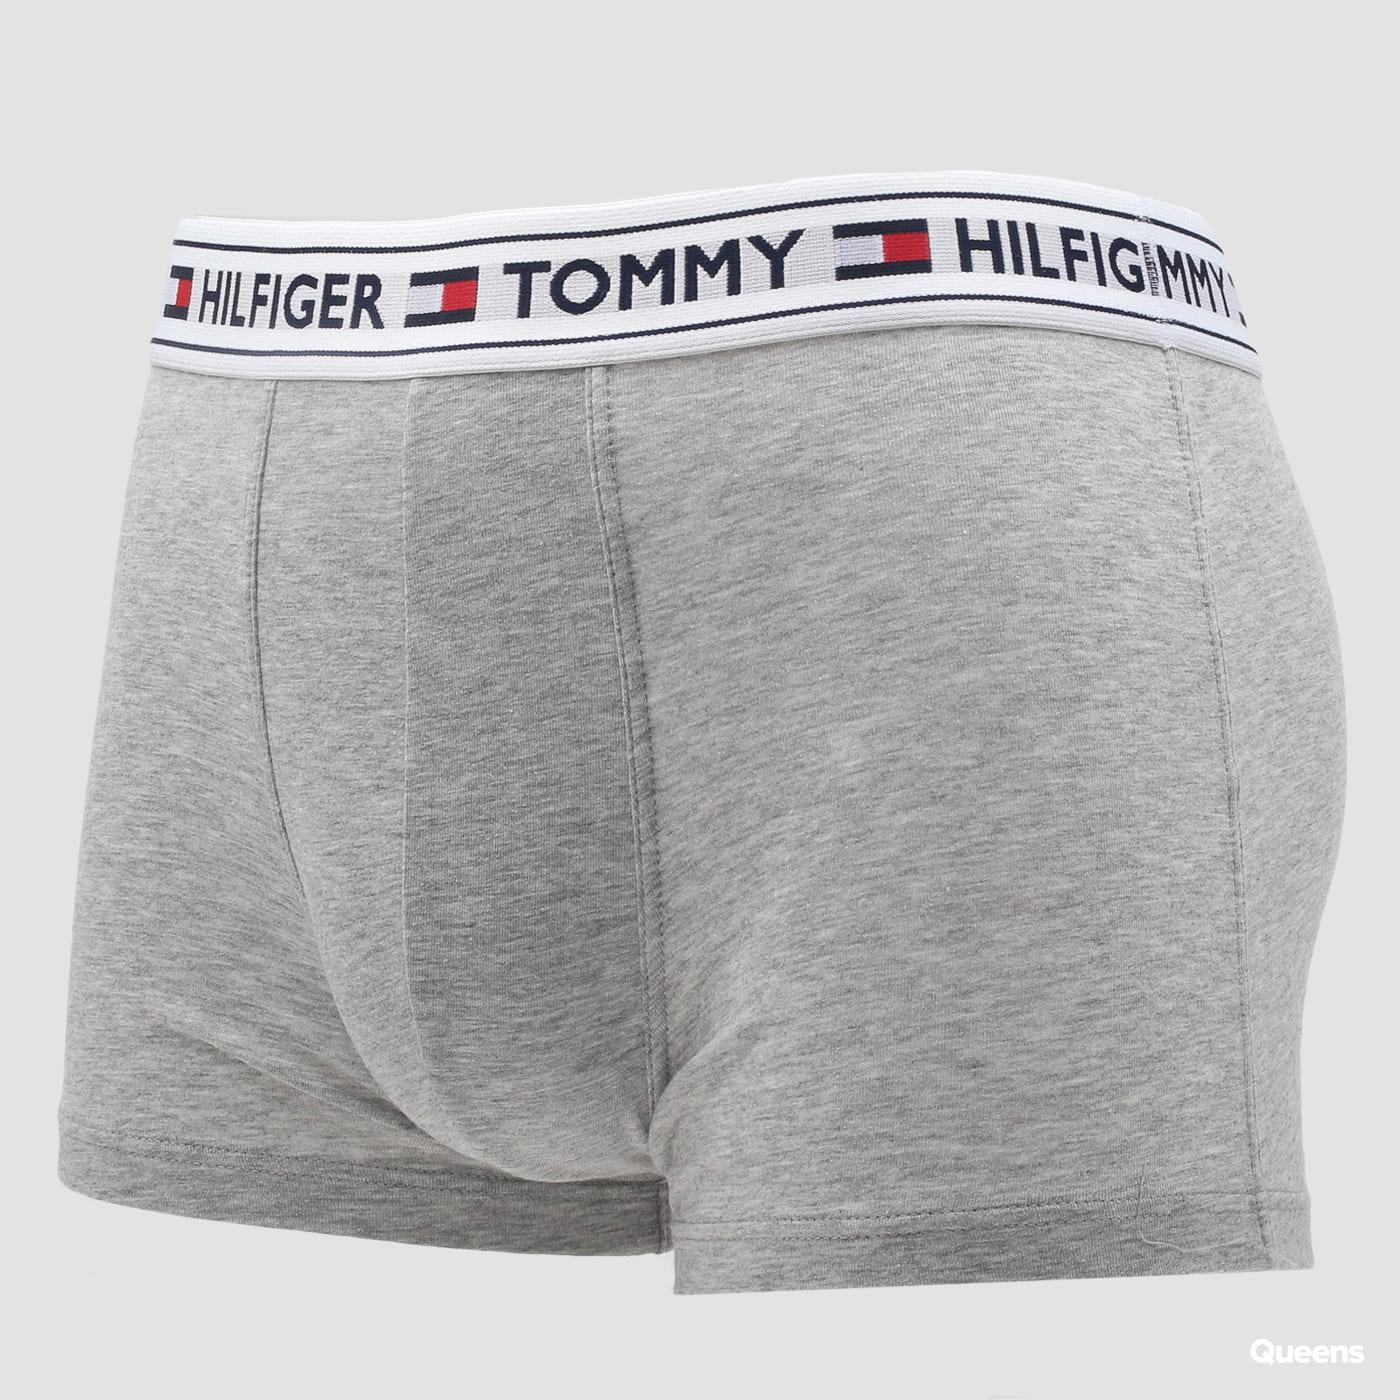 Tommy Hilfiger Authentic Trunk C/O grau melange